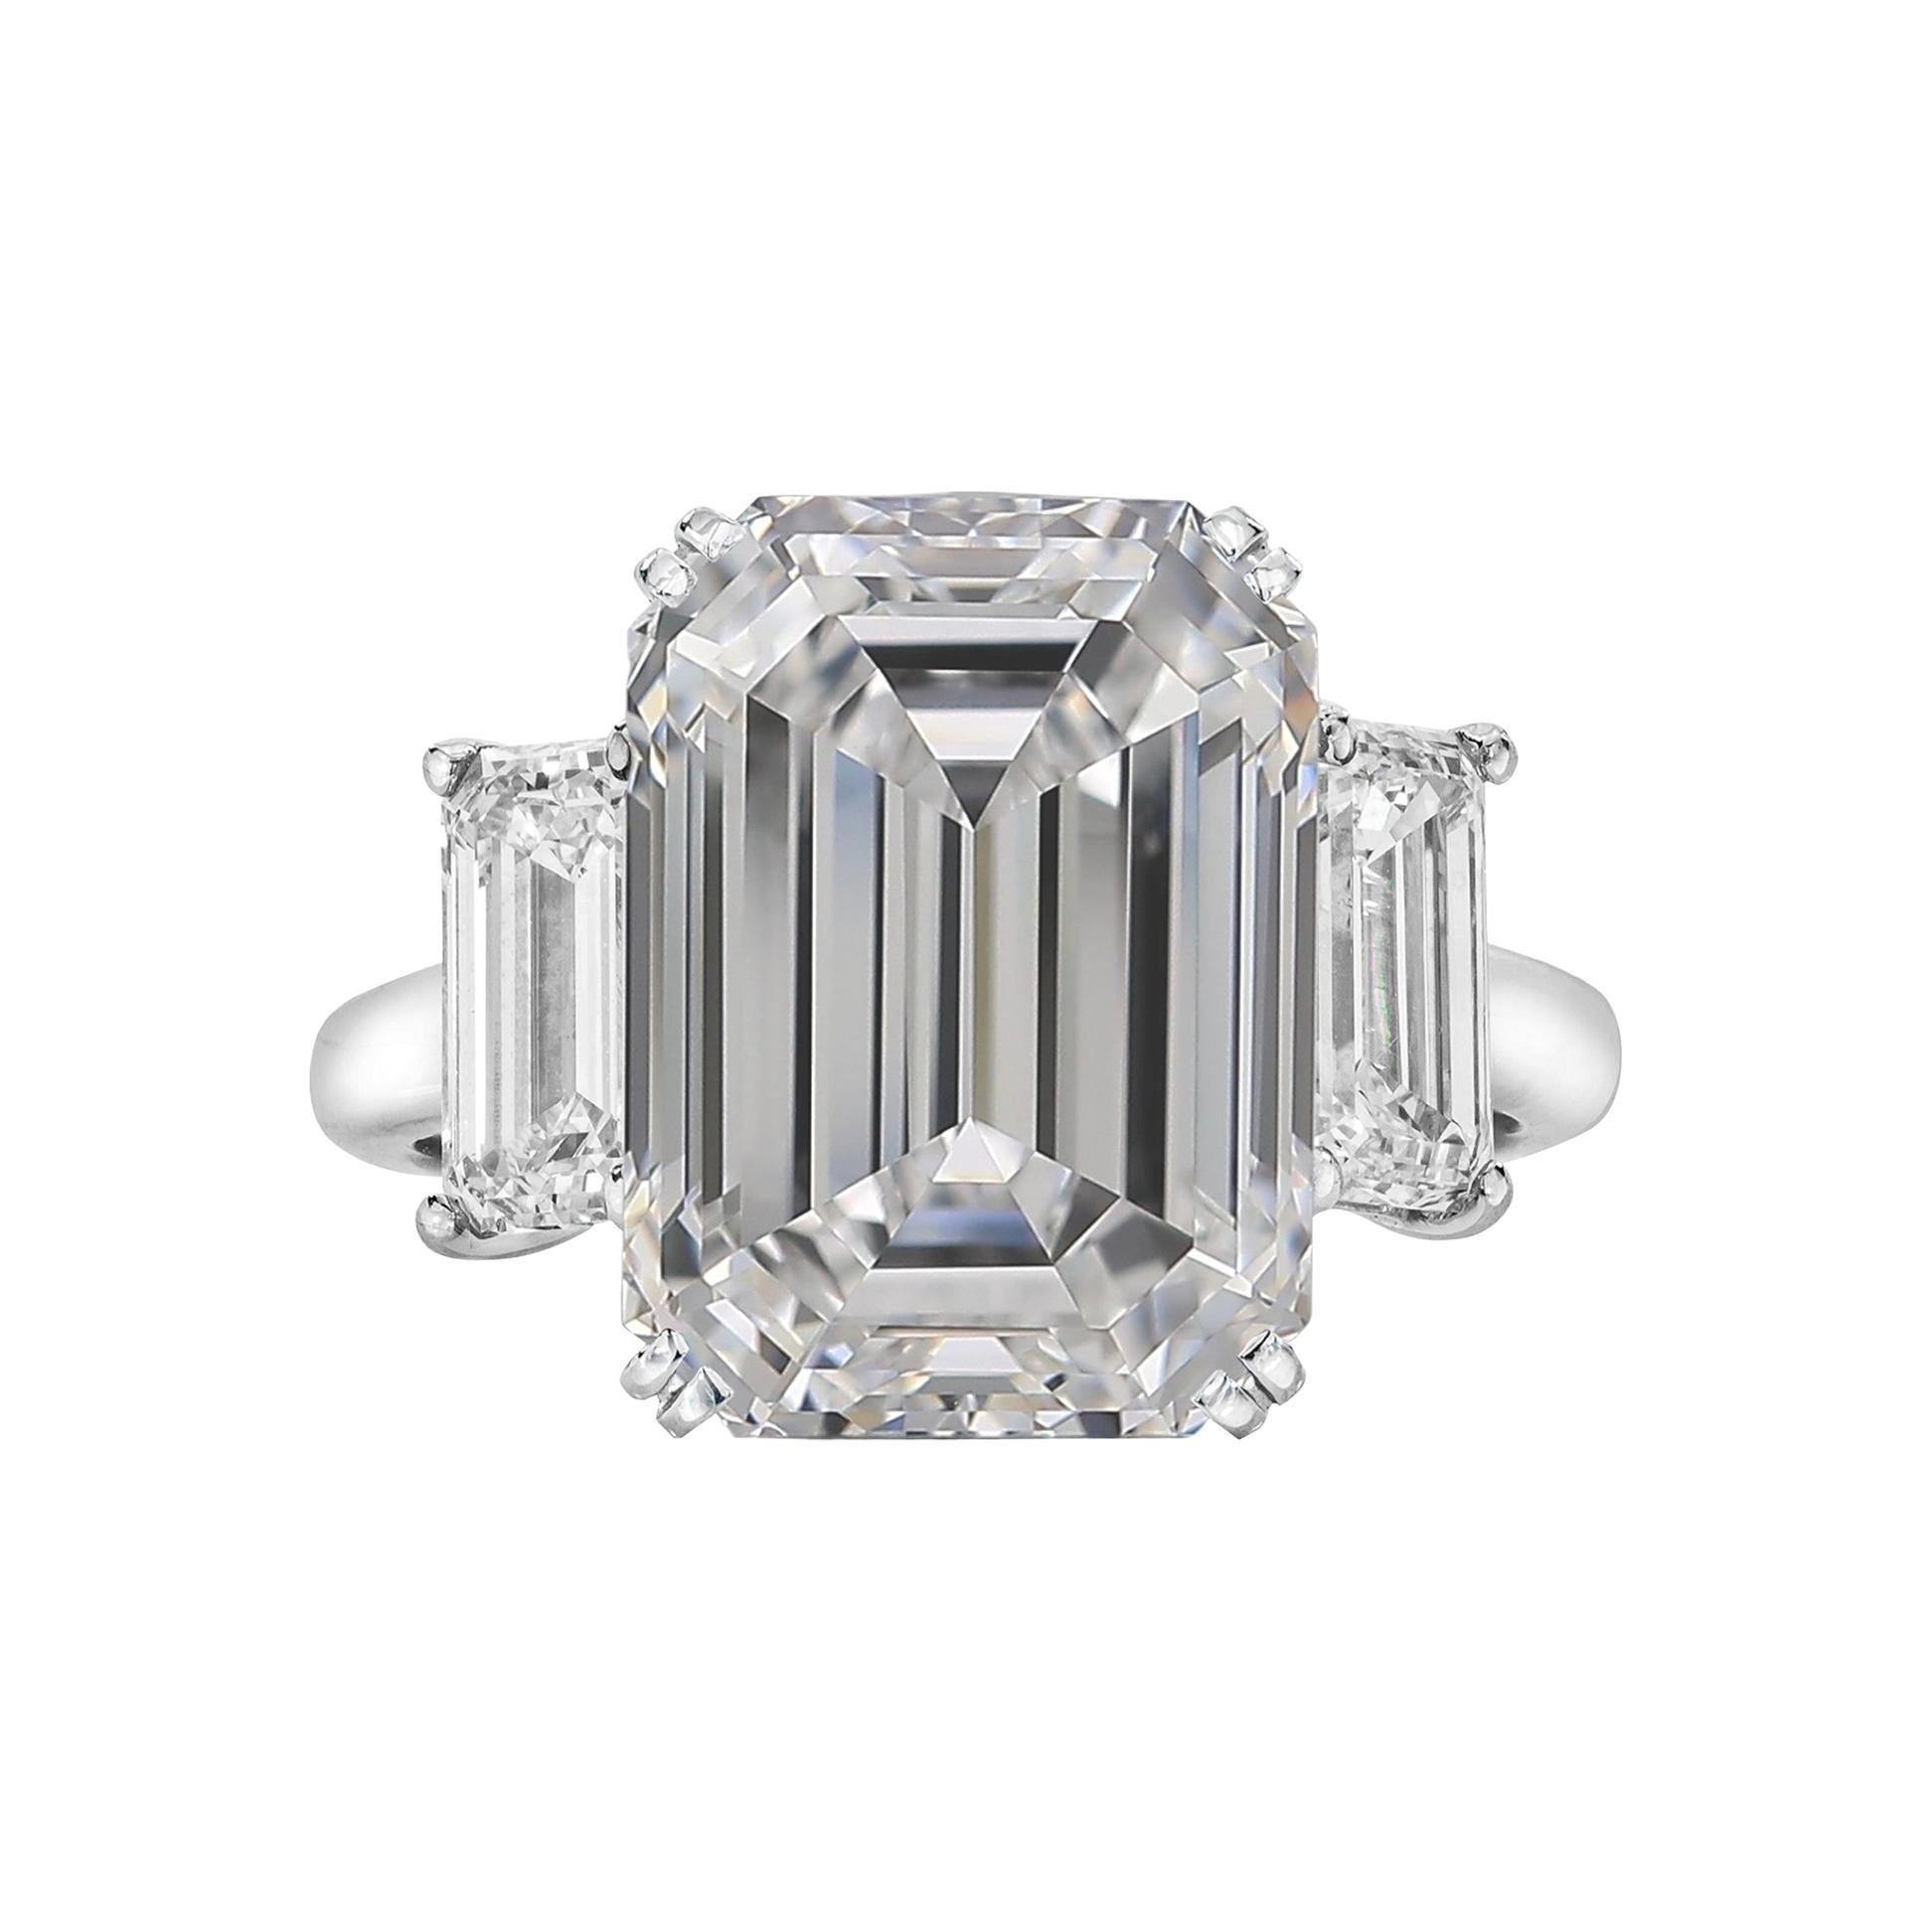 GIA Certified 3.50 Carat Three-Stone Emerald Cut Diamond Platinum Ring